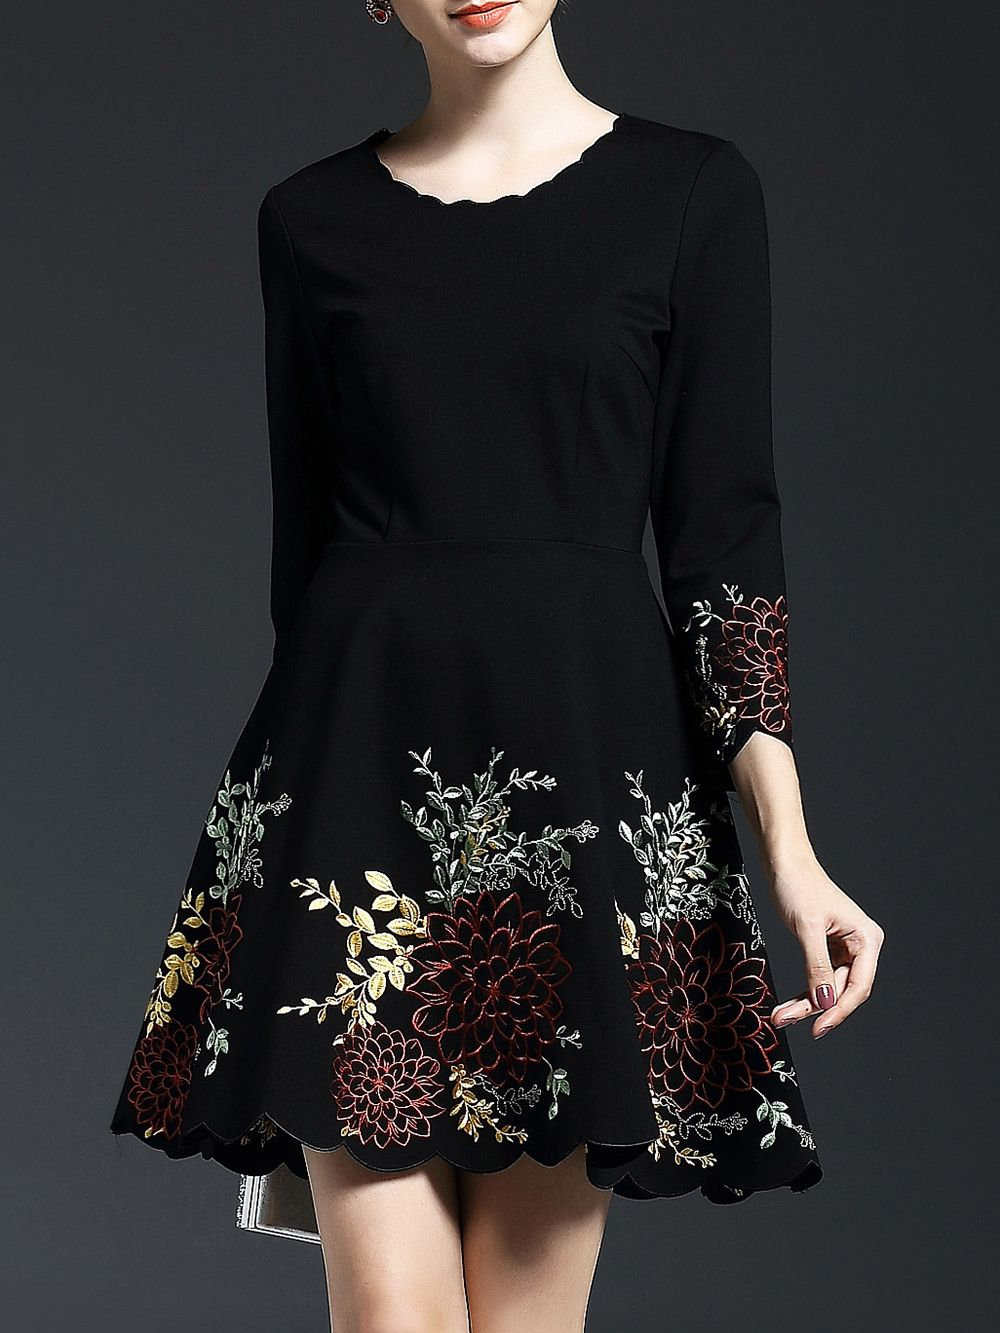 Shop Black Flowers Embroidered A Line Dress Online Shein Offers Black Flowers Embroidered A Line Dress Amp M Velvet Dress Designs Fashion Embroidery Fashion [ 1333 x 1000 Pixel ]